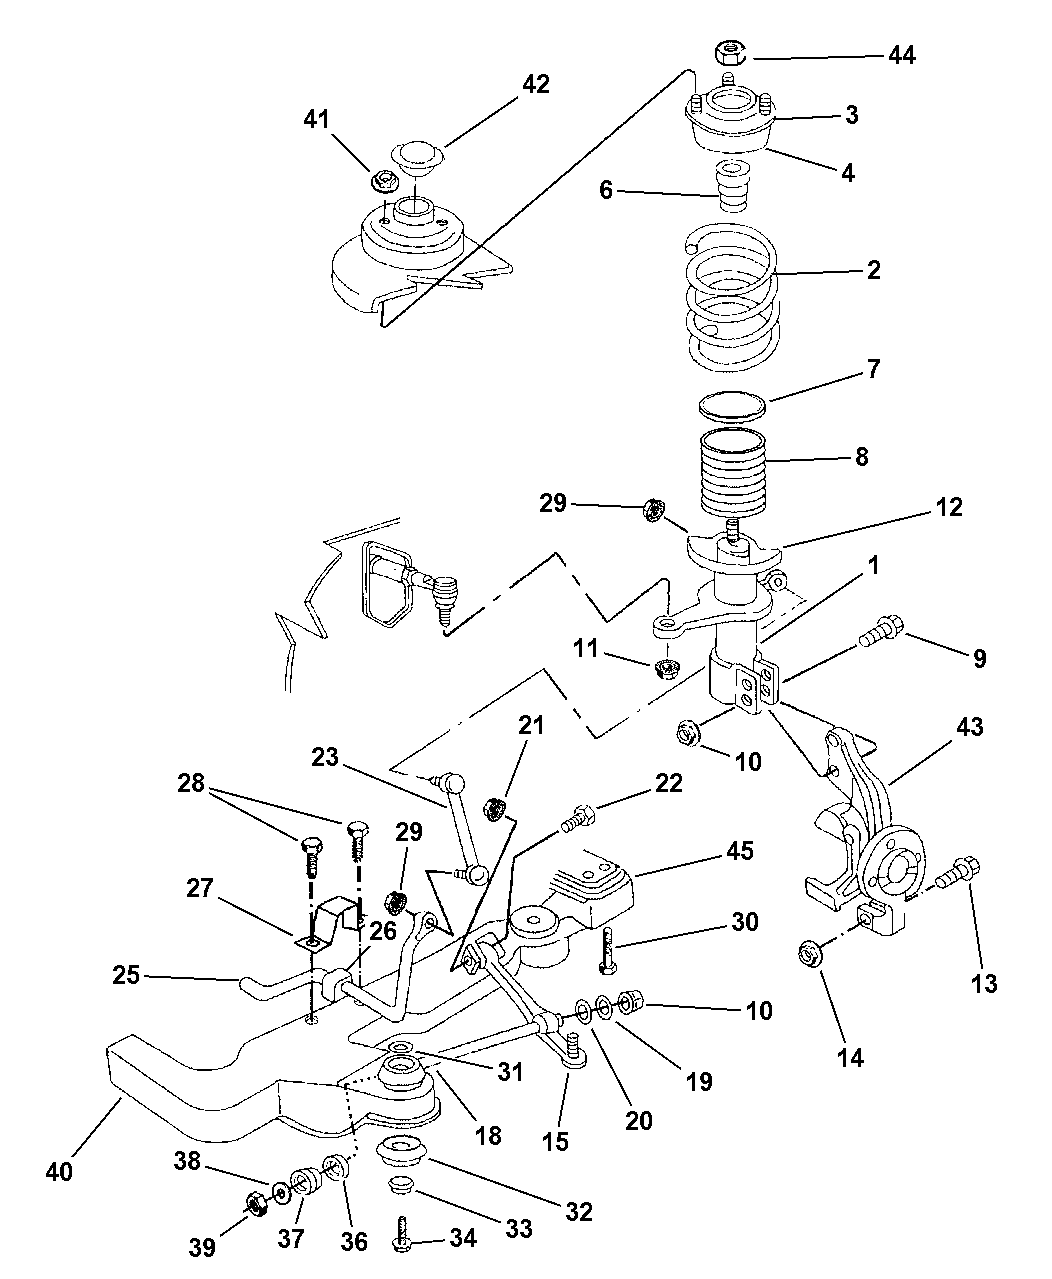 2002 Dodge Intrepid Suspension Diagram   refund-decorati Wiring Diagram  Page - refund-decorati.reteambito.itRete territoriale di ambito 2